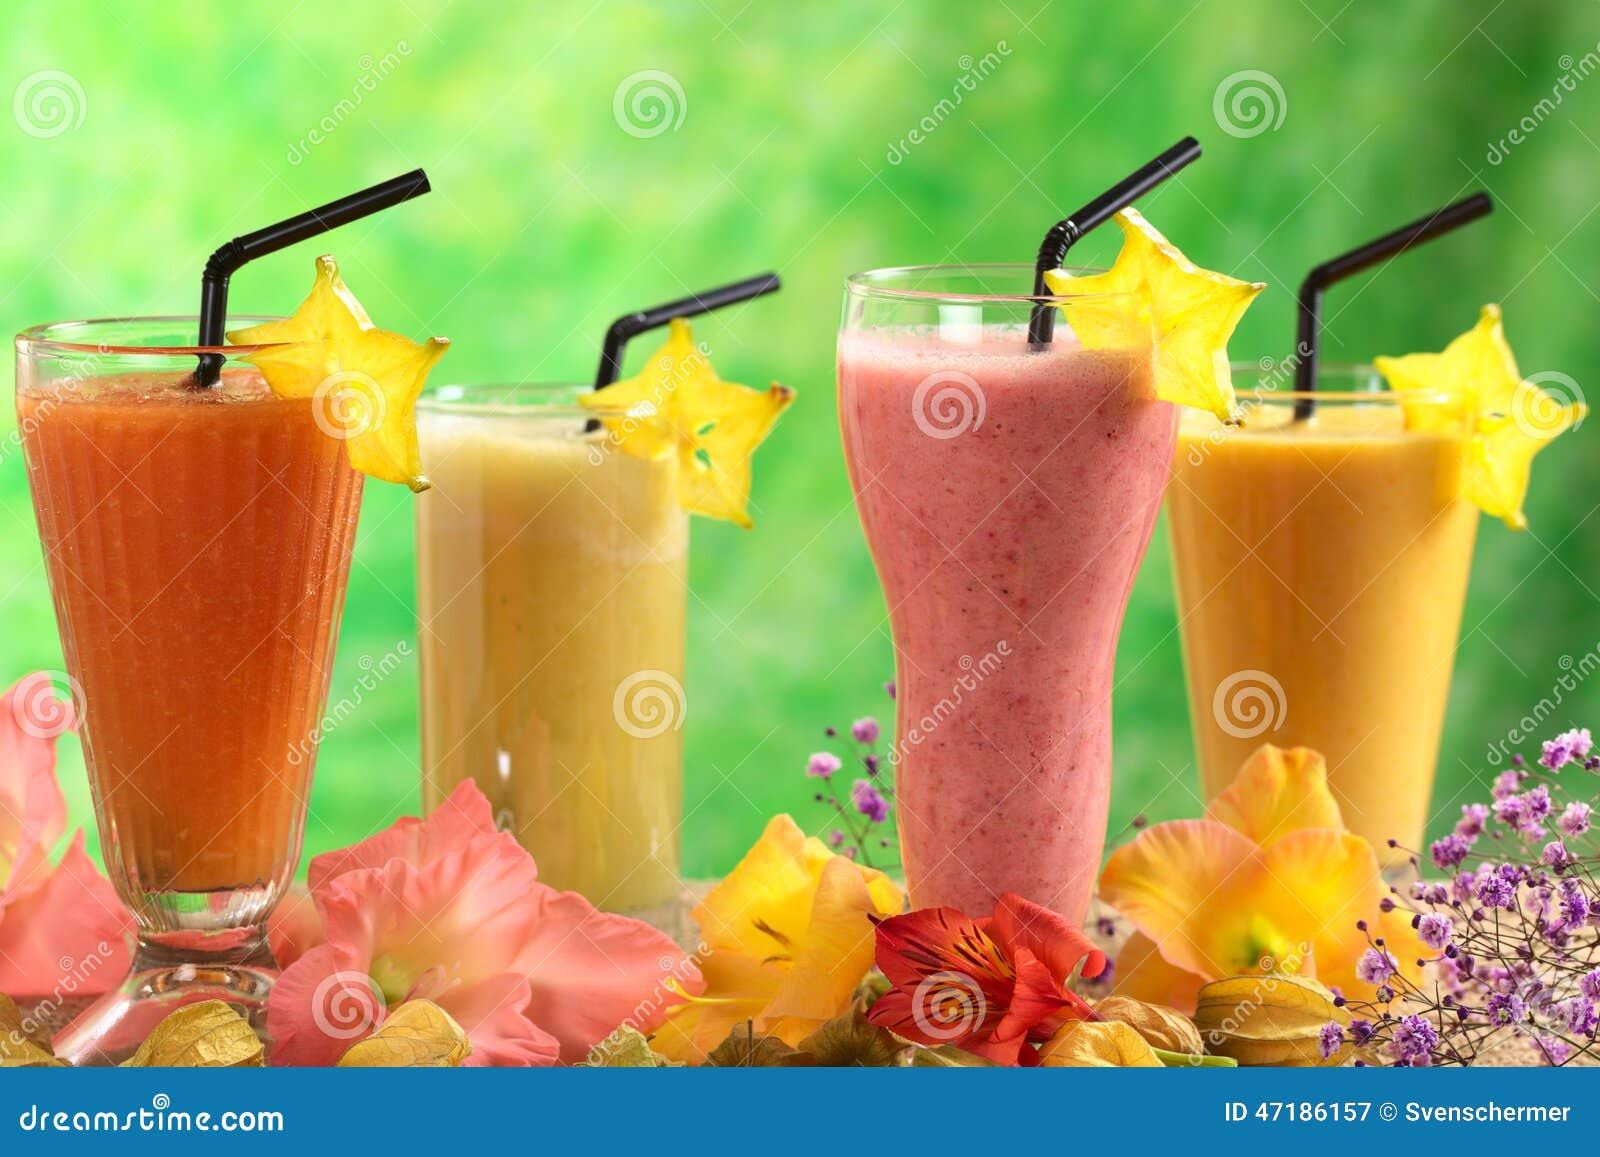 Fresh Juices and Milkshakes